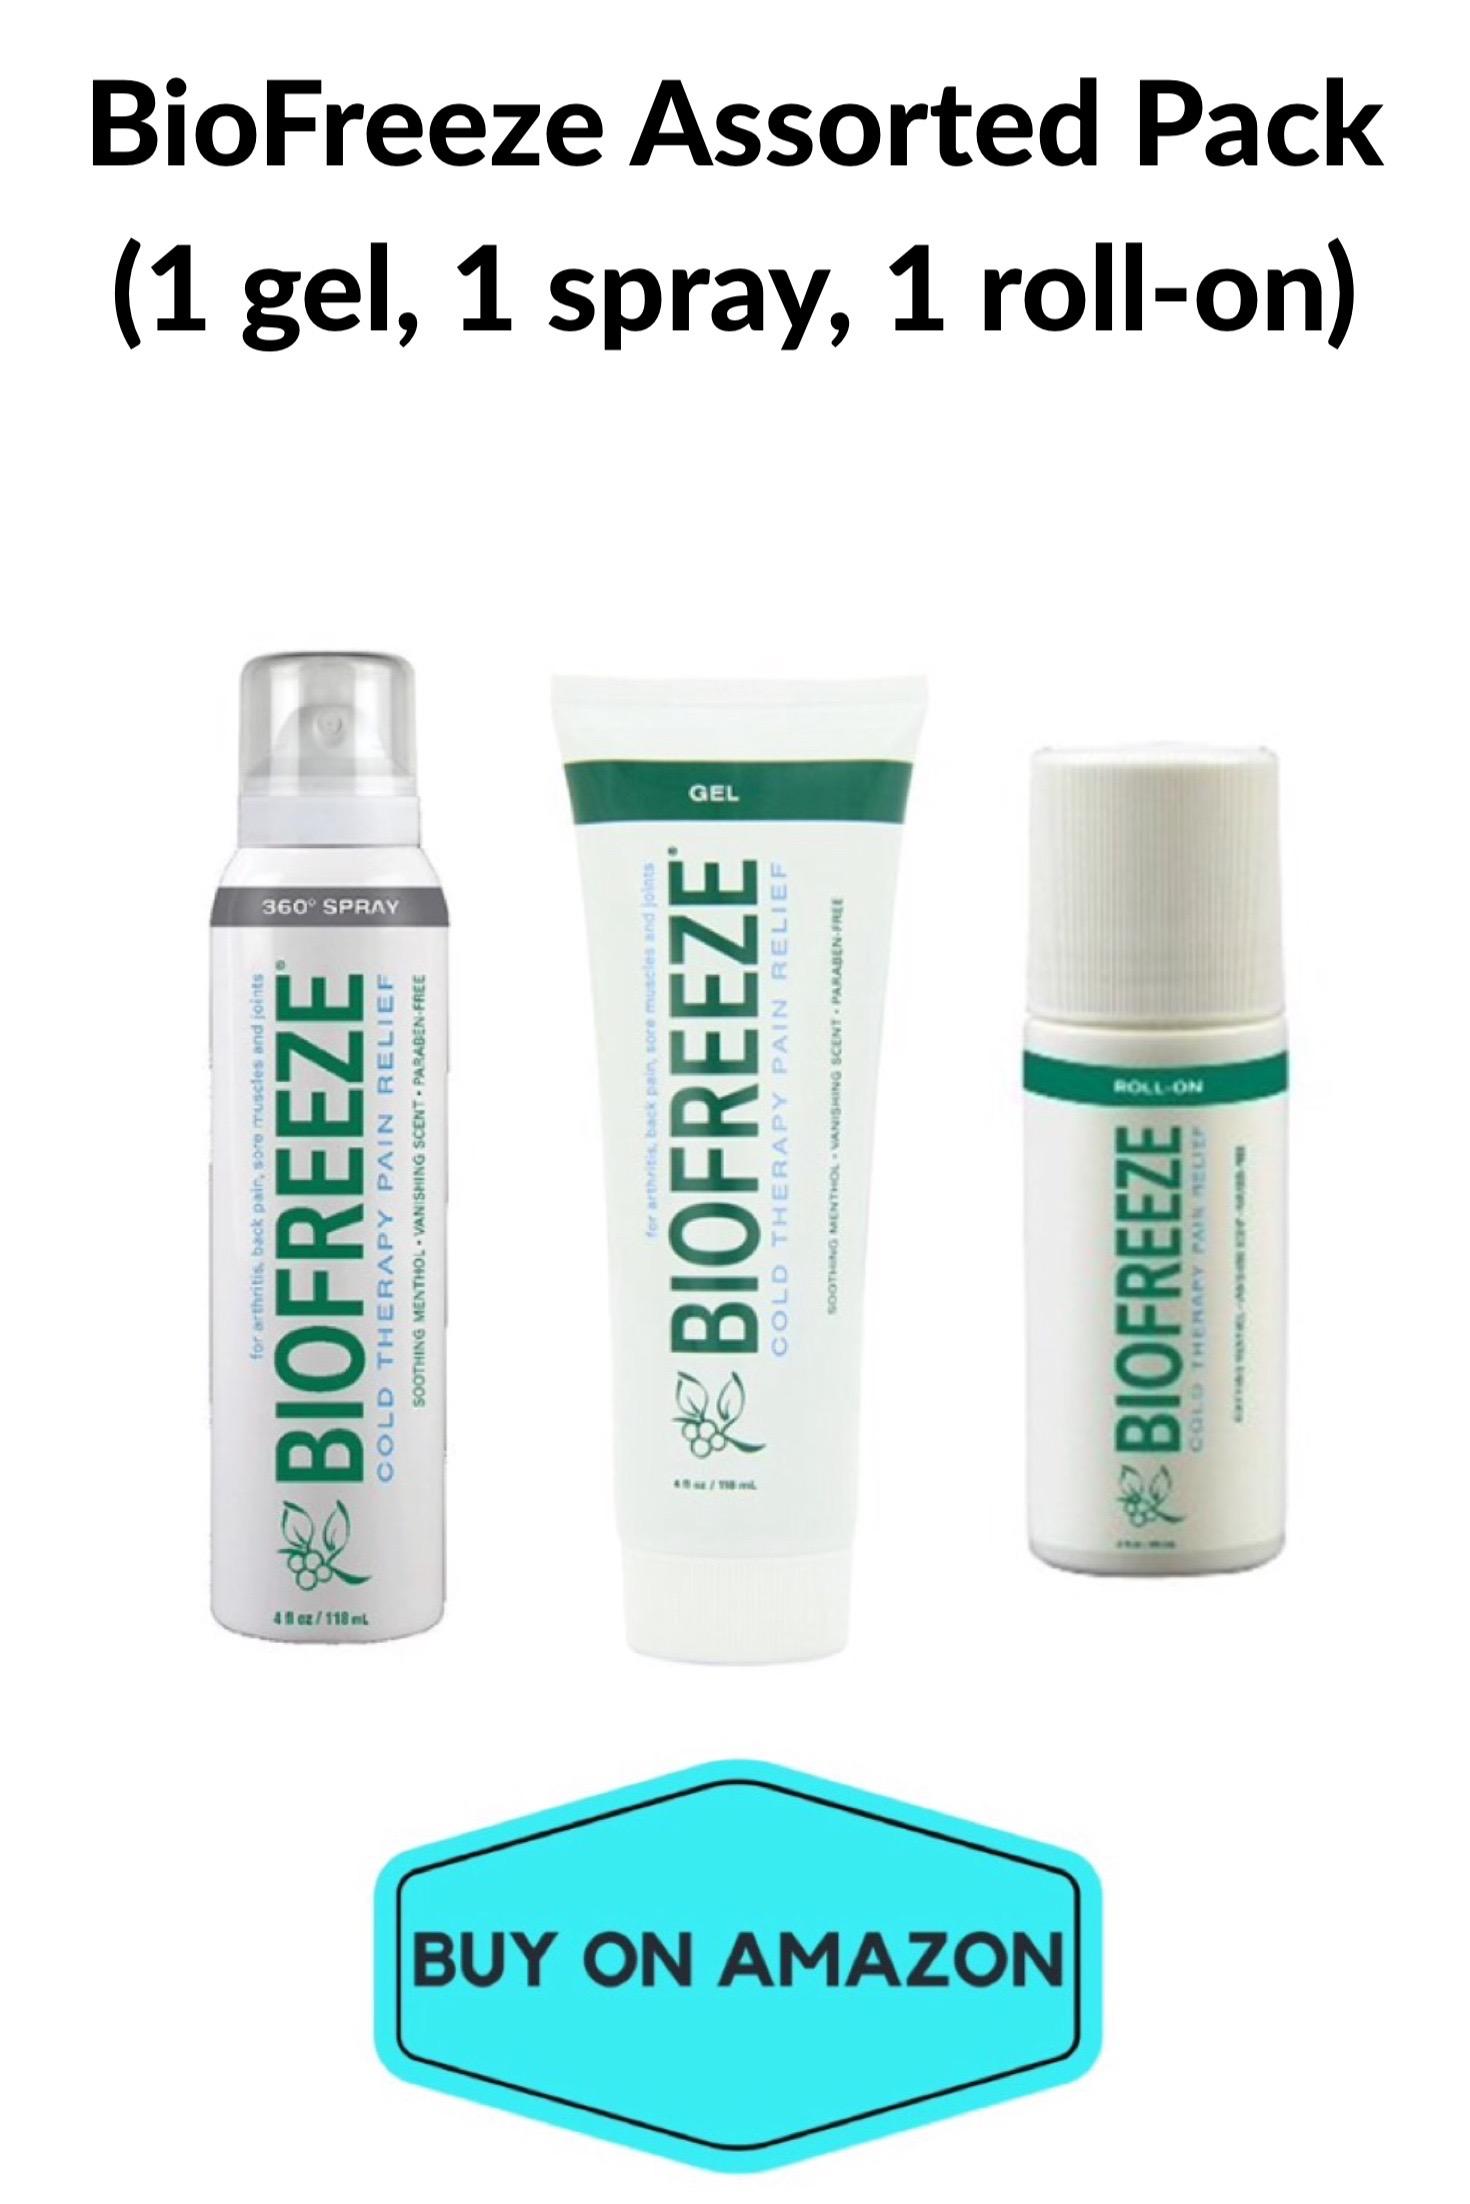 BioFreeze Assorted Pack